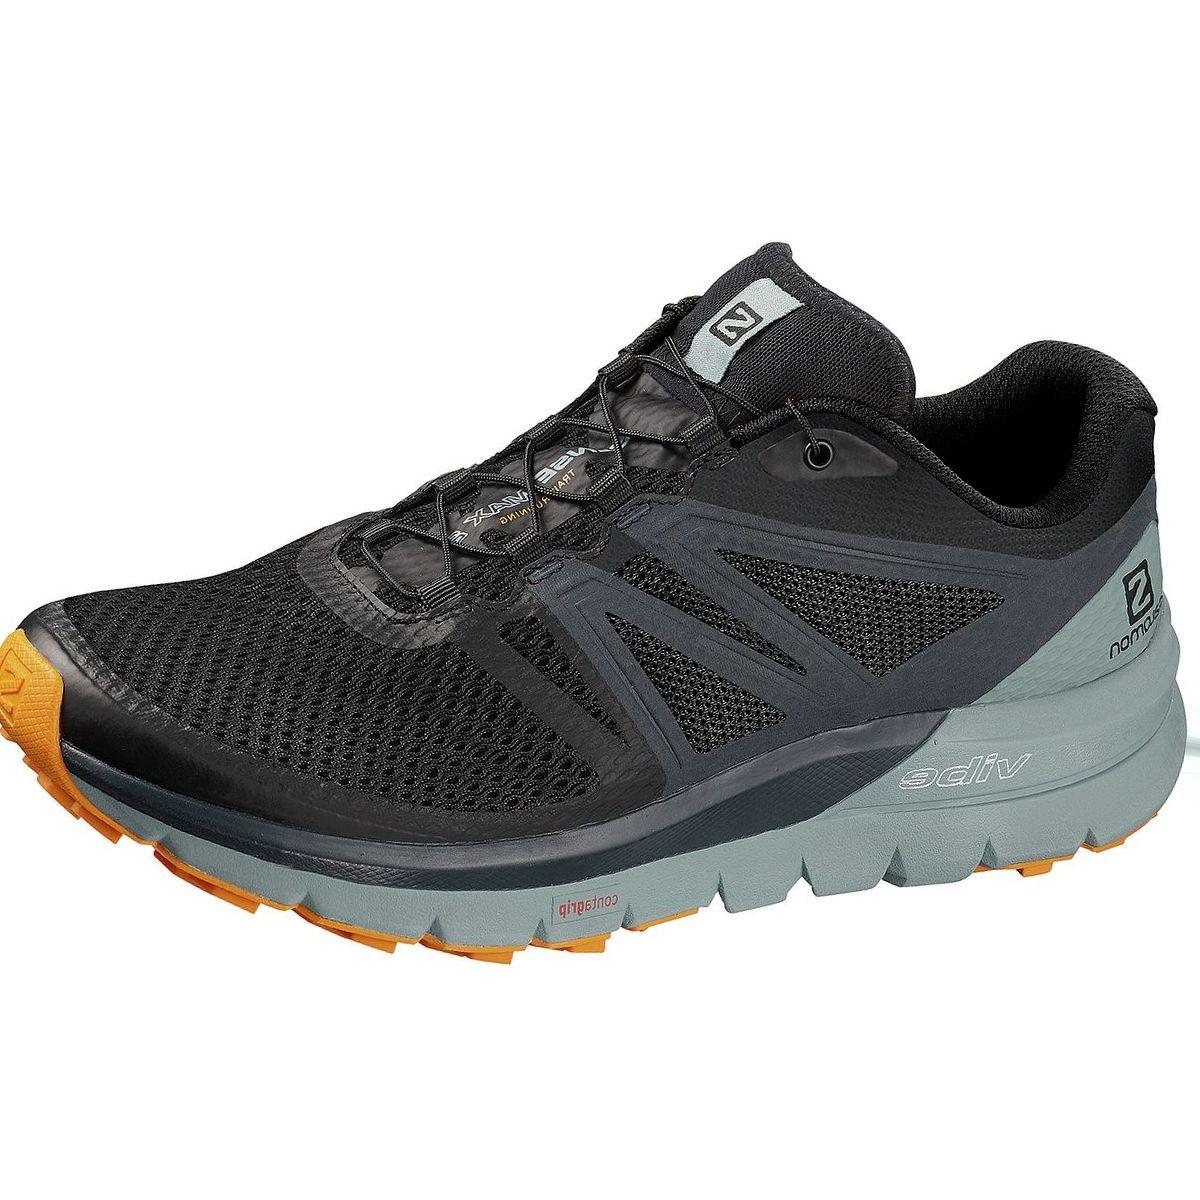 Salomon Sense Max 2 Trail Running Shoe - Men's